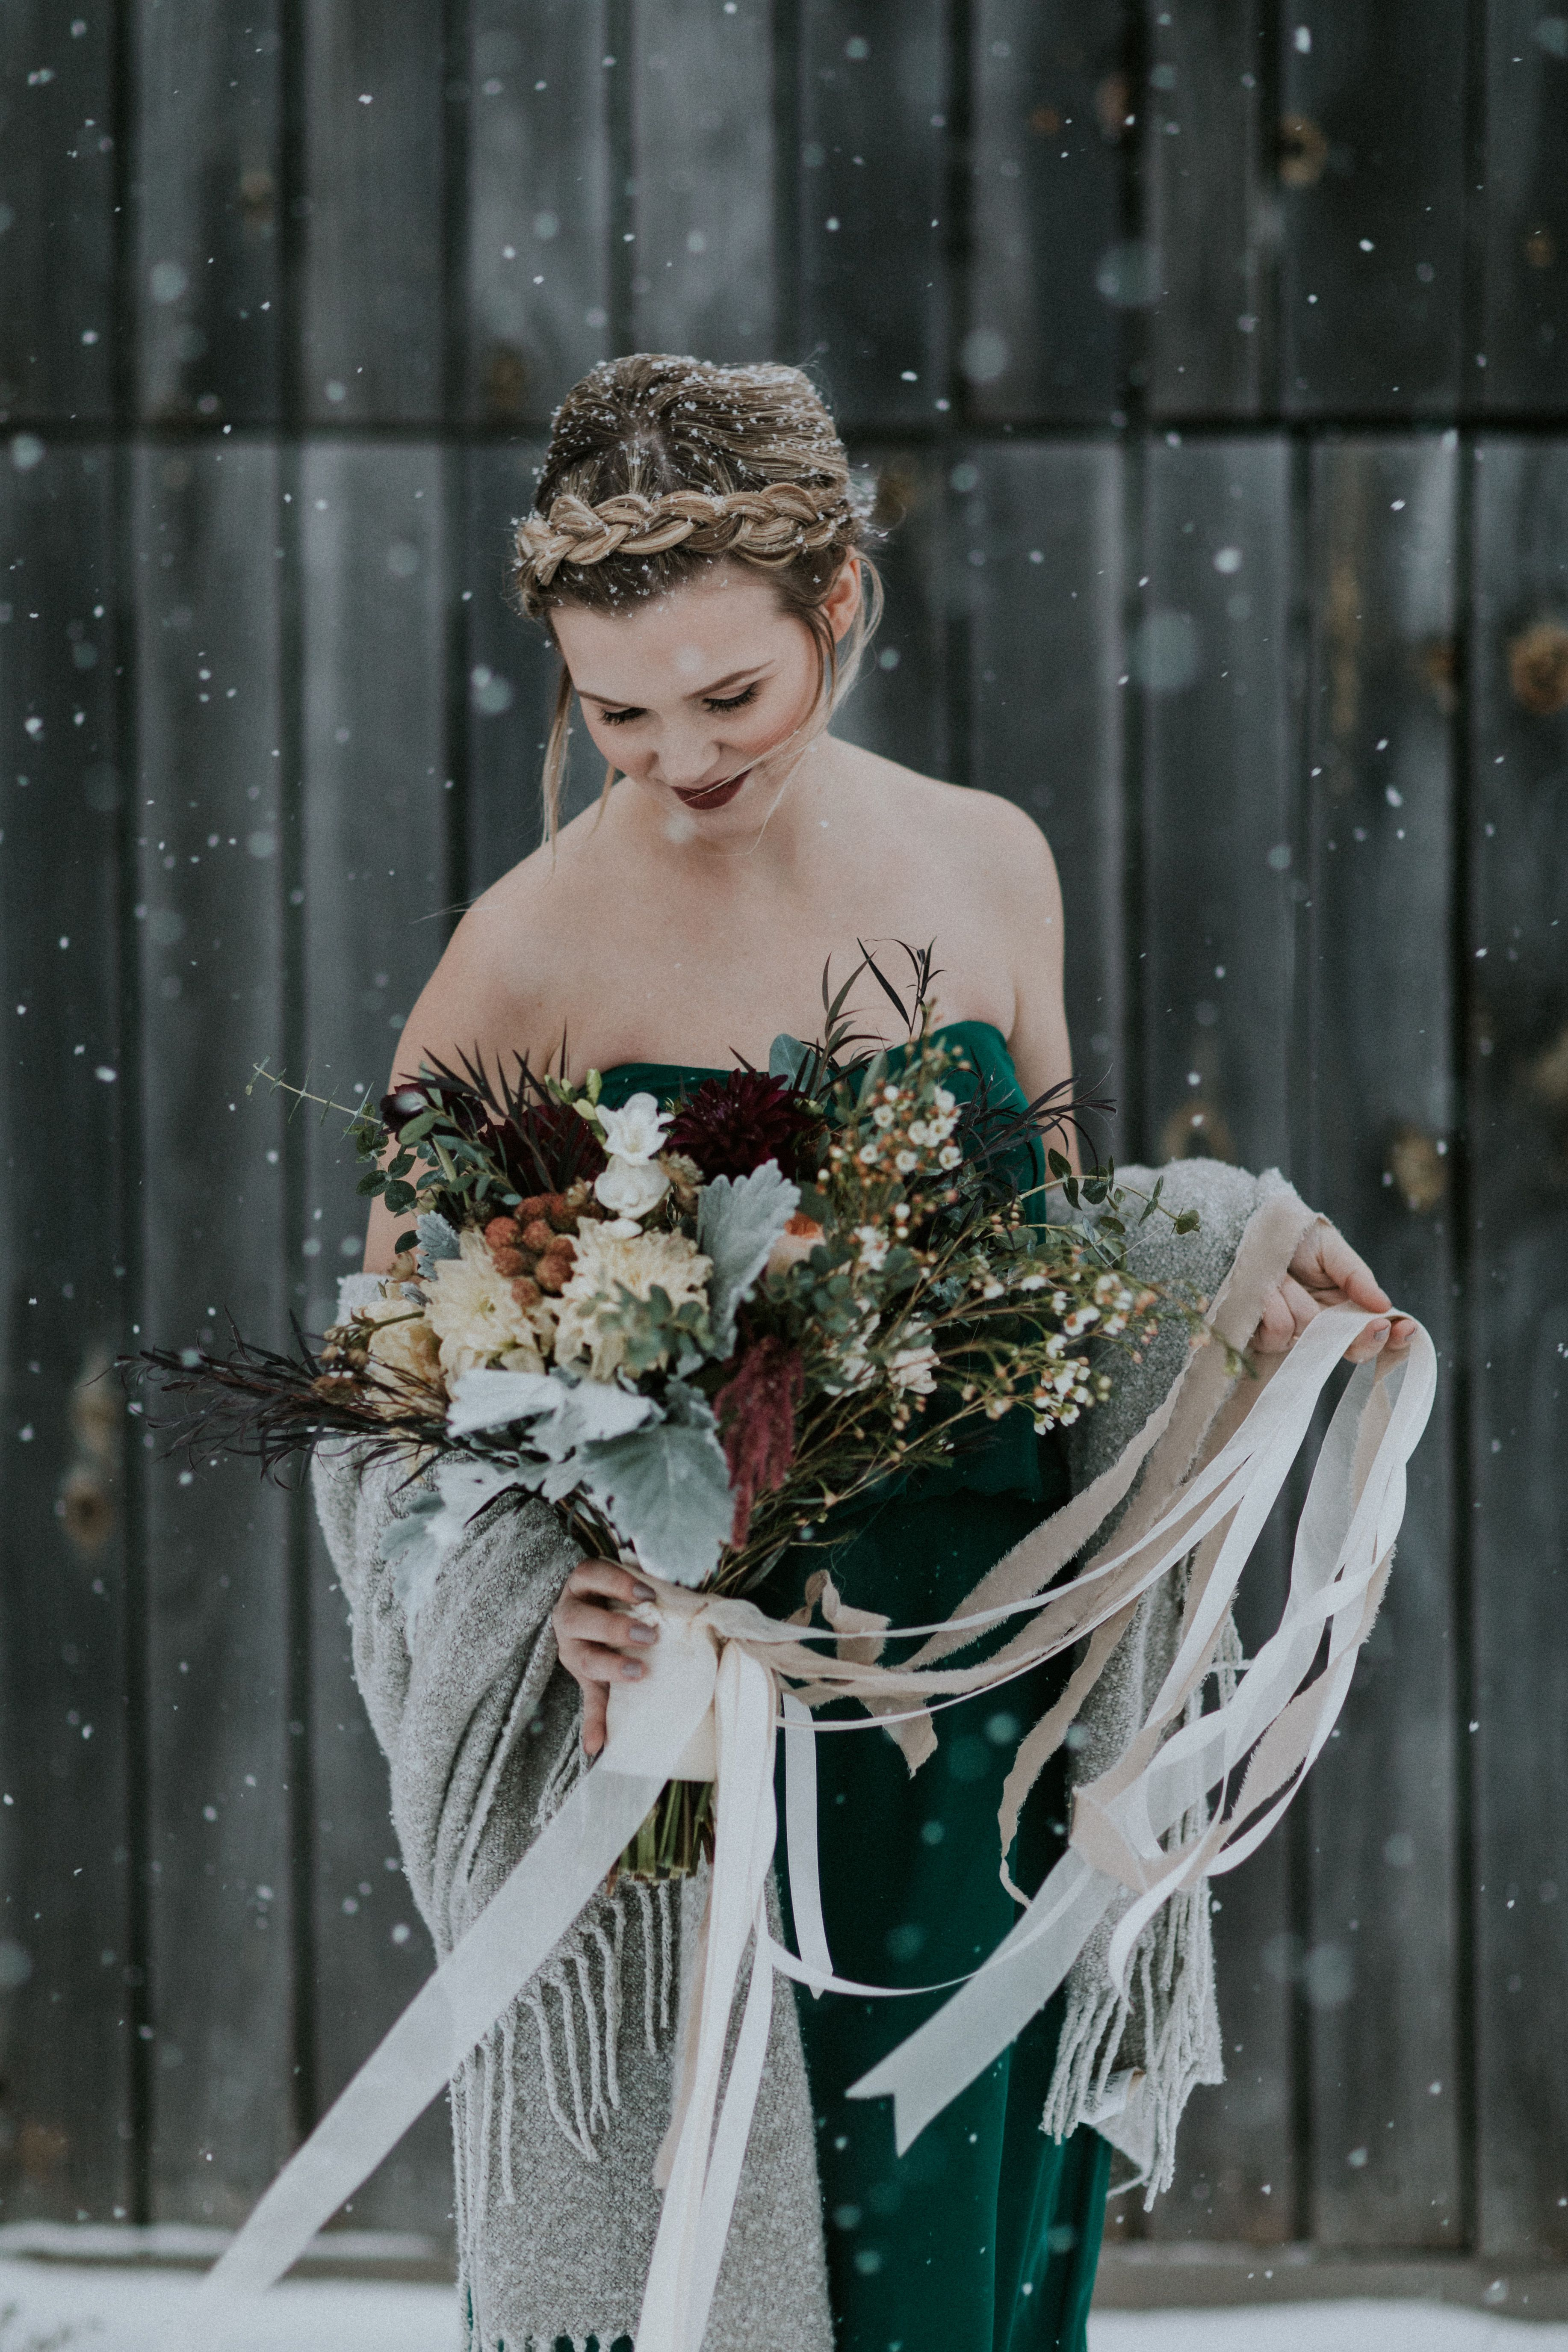 Bridal Portrait in the Snow